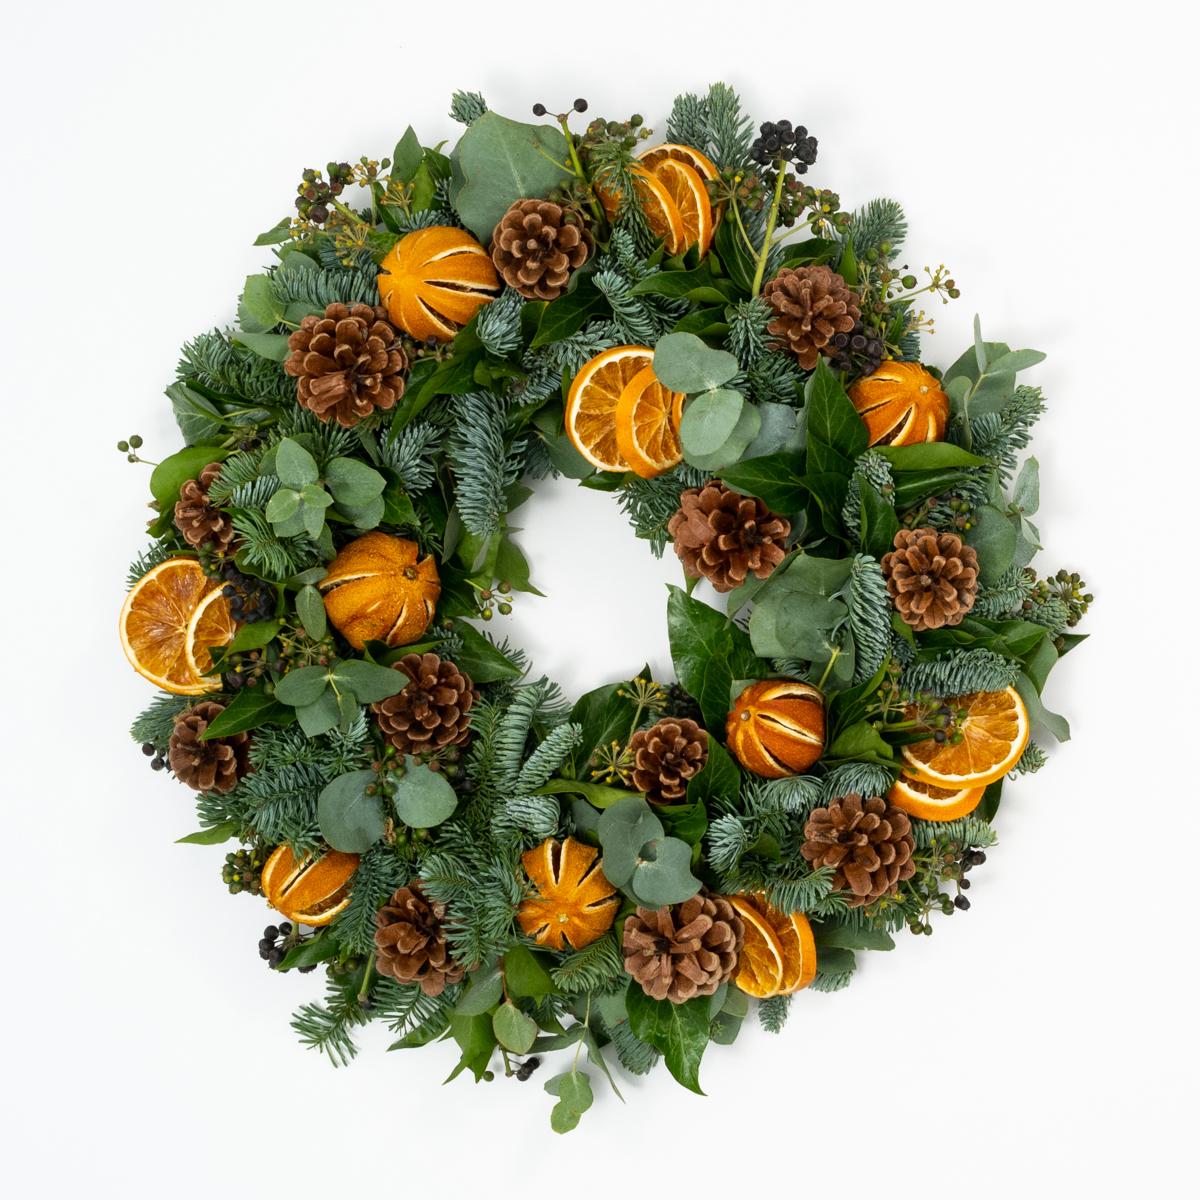 Bloom Flower Delivery | DIY Wreath Kit - Berried Clementine